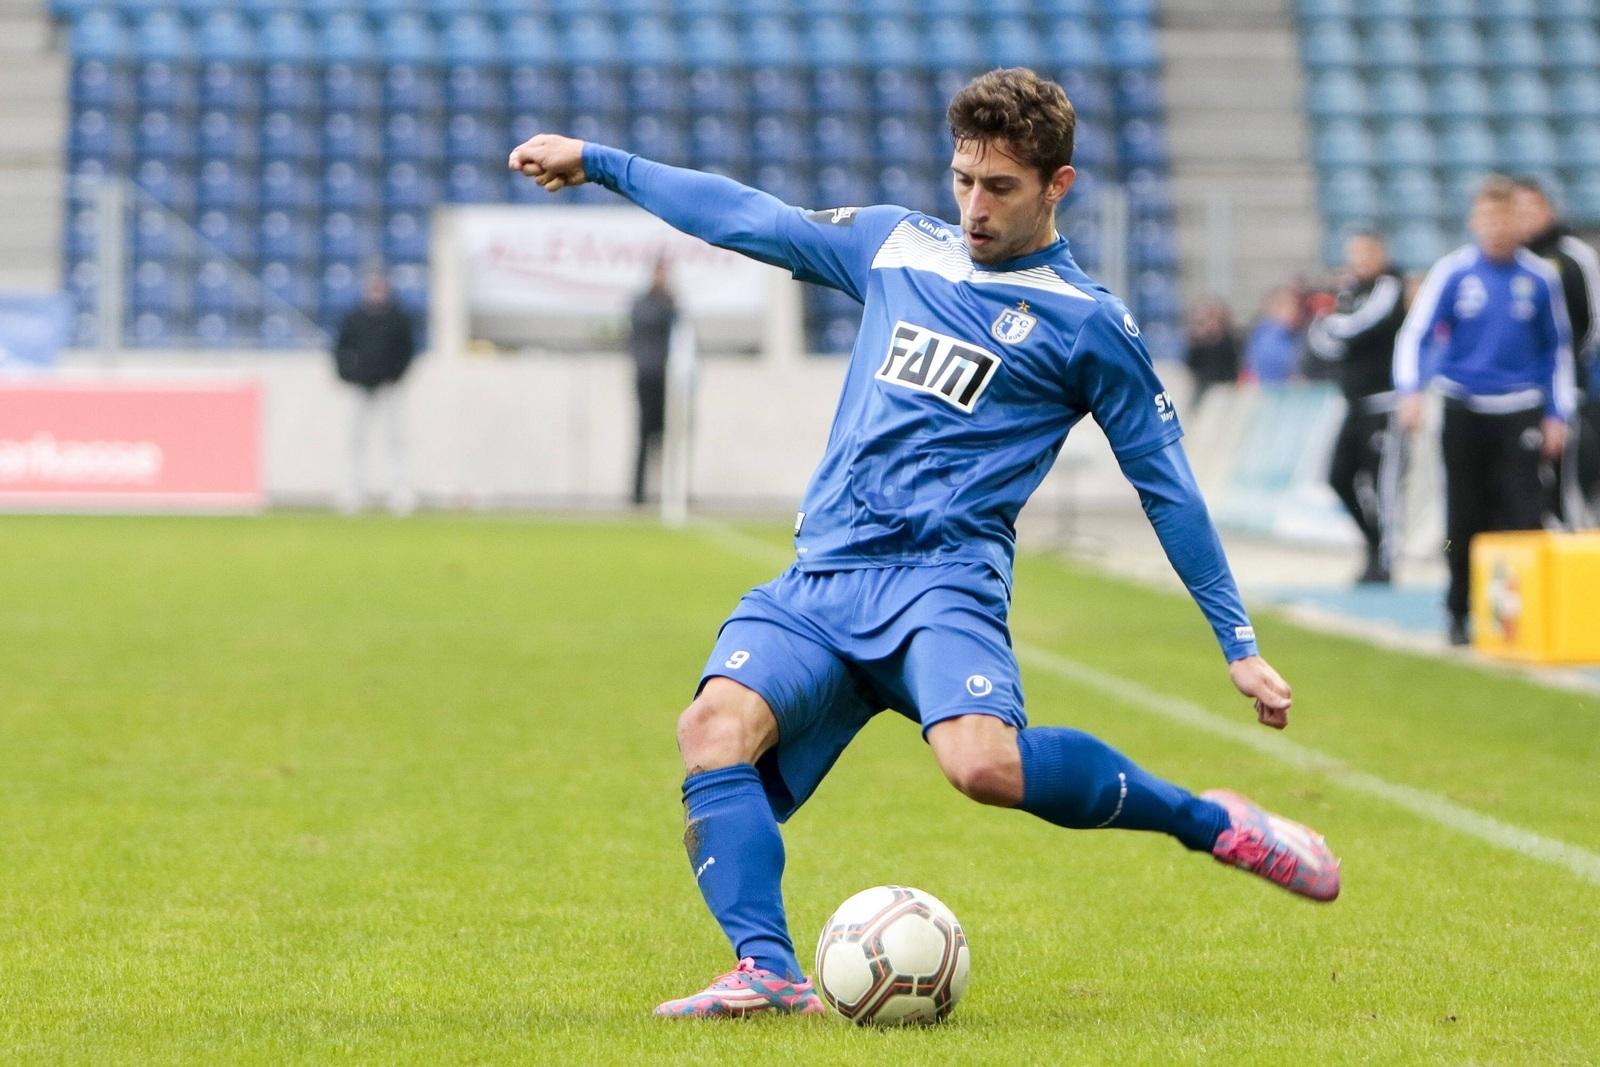 Manuel Farrona Pulido, Offensivmann des 1. FC Magdeburg.